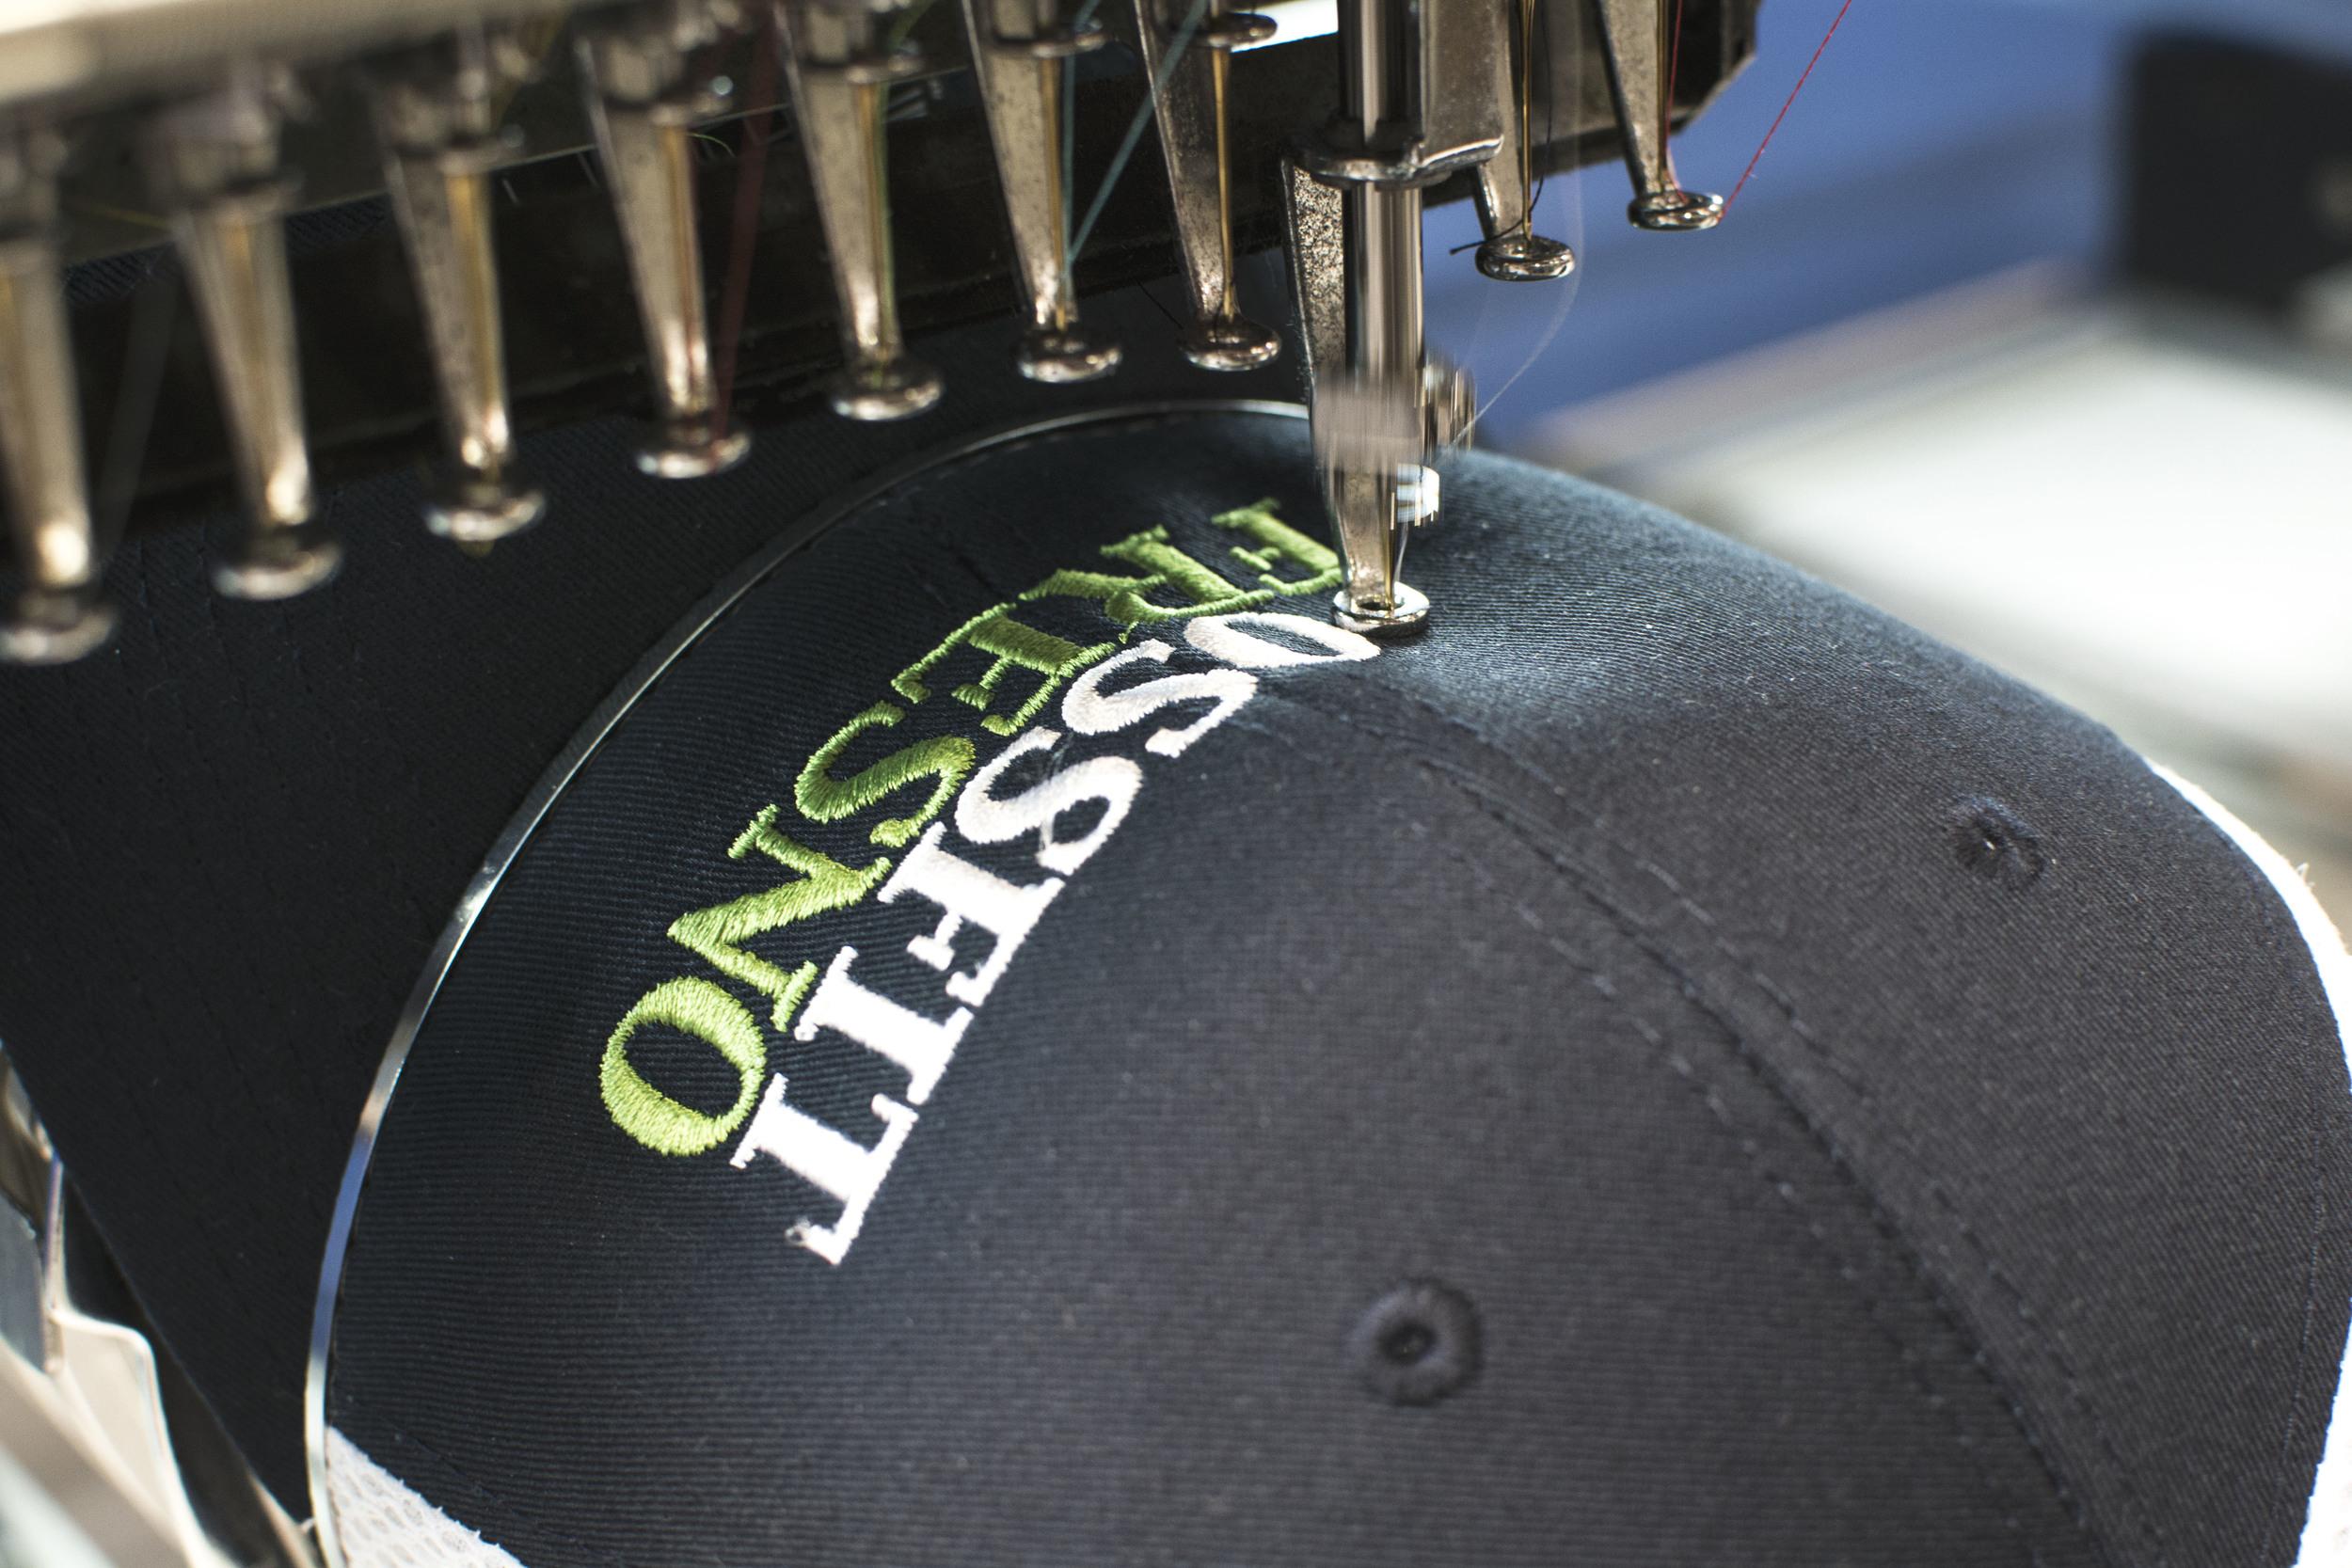 Crossfit Embroider.jpg